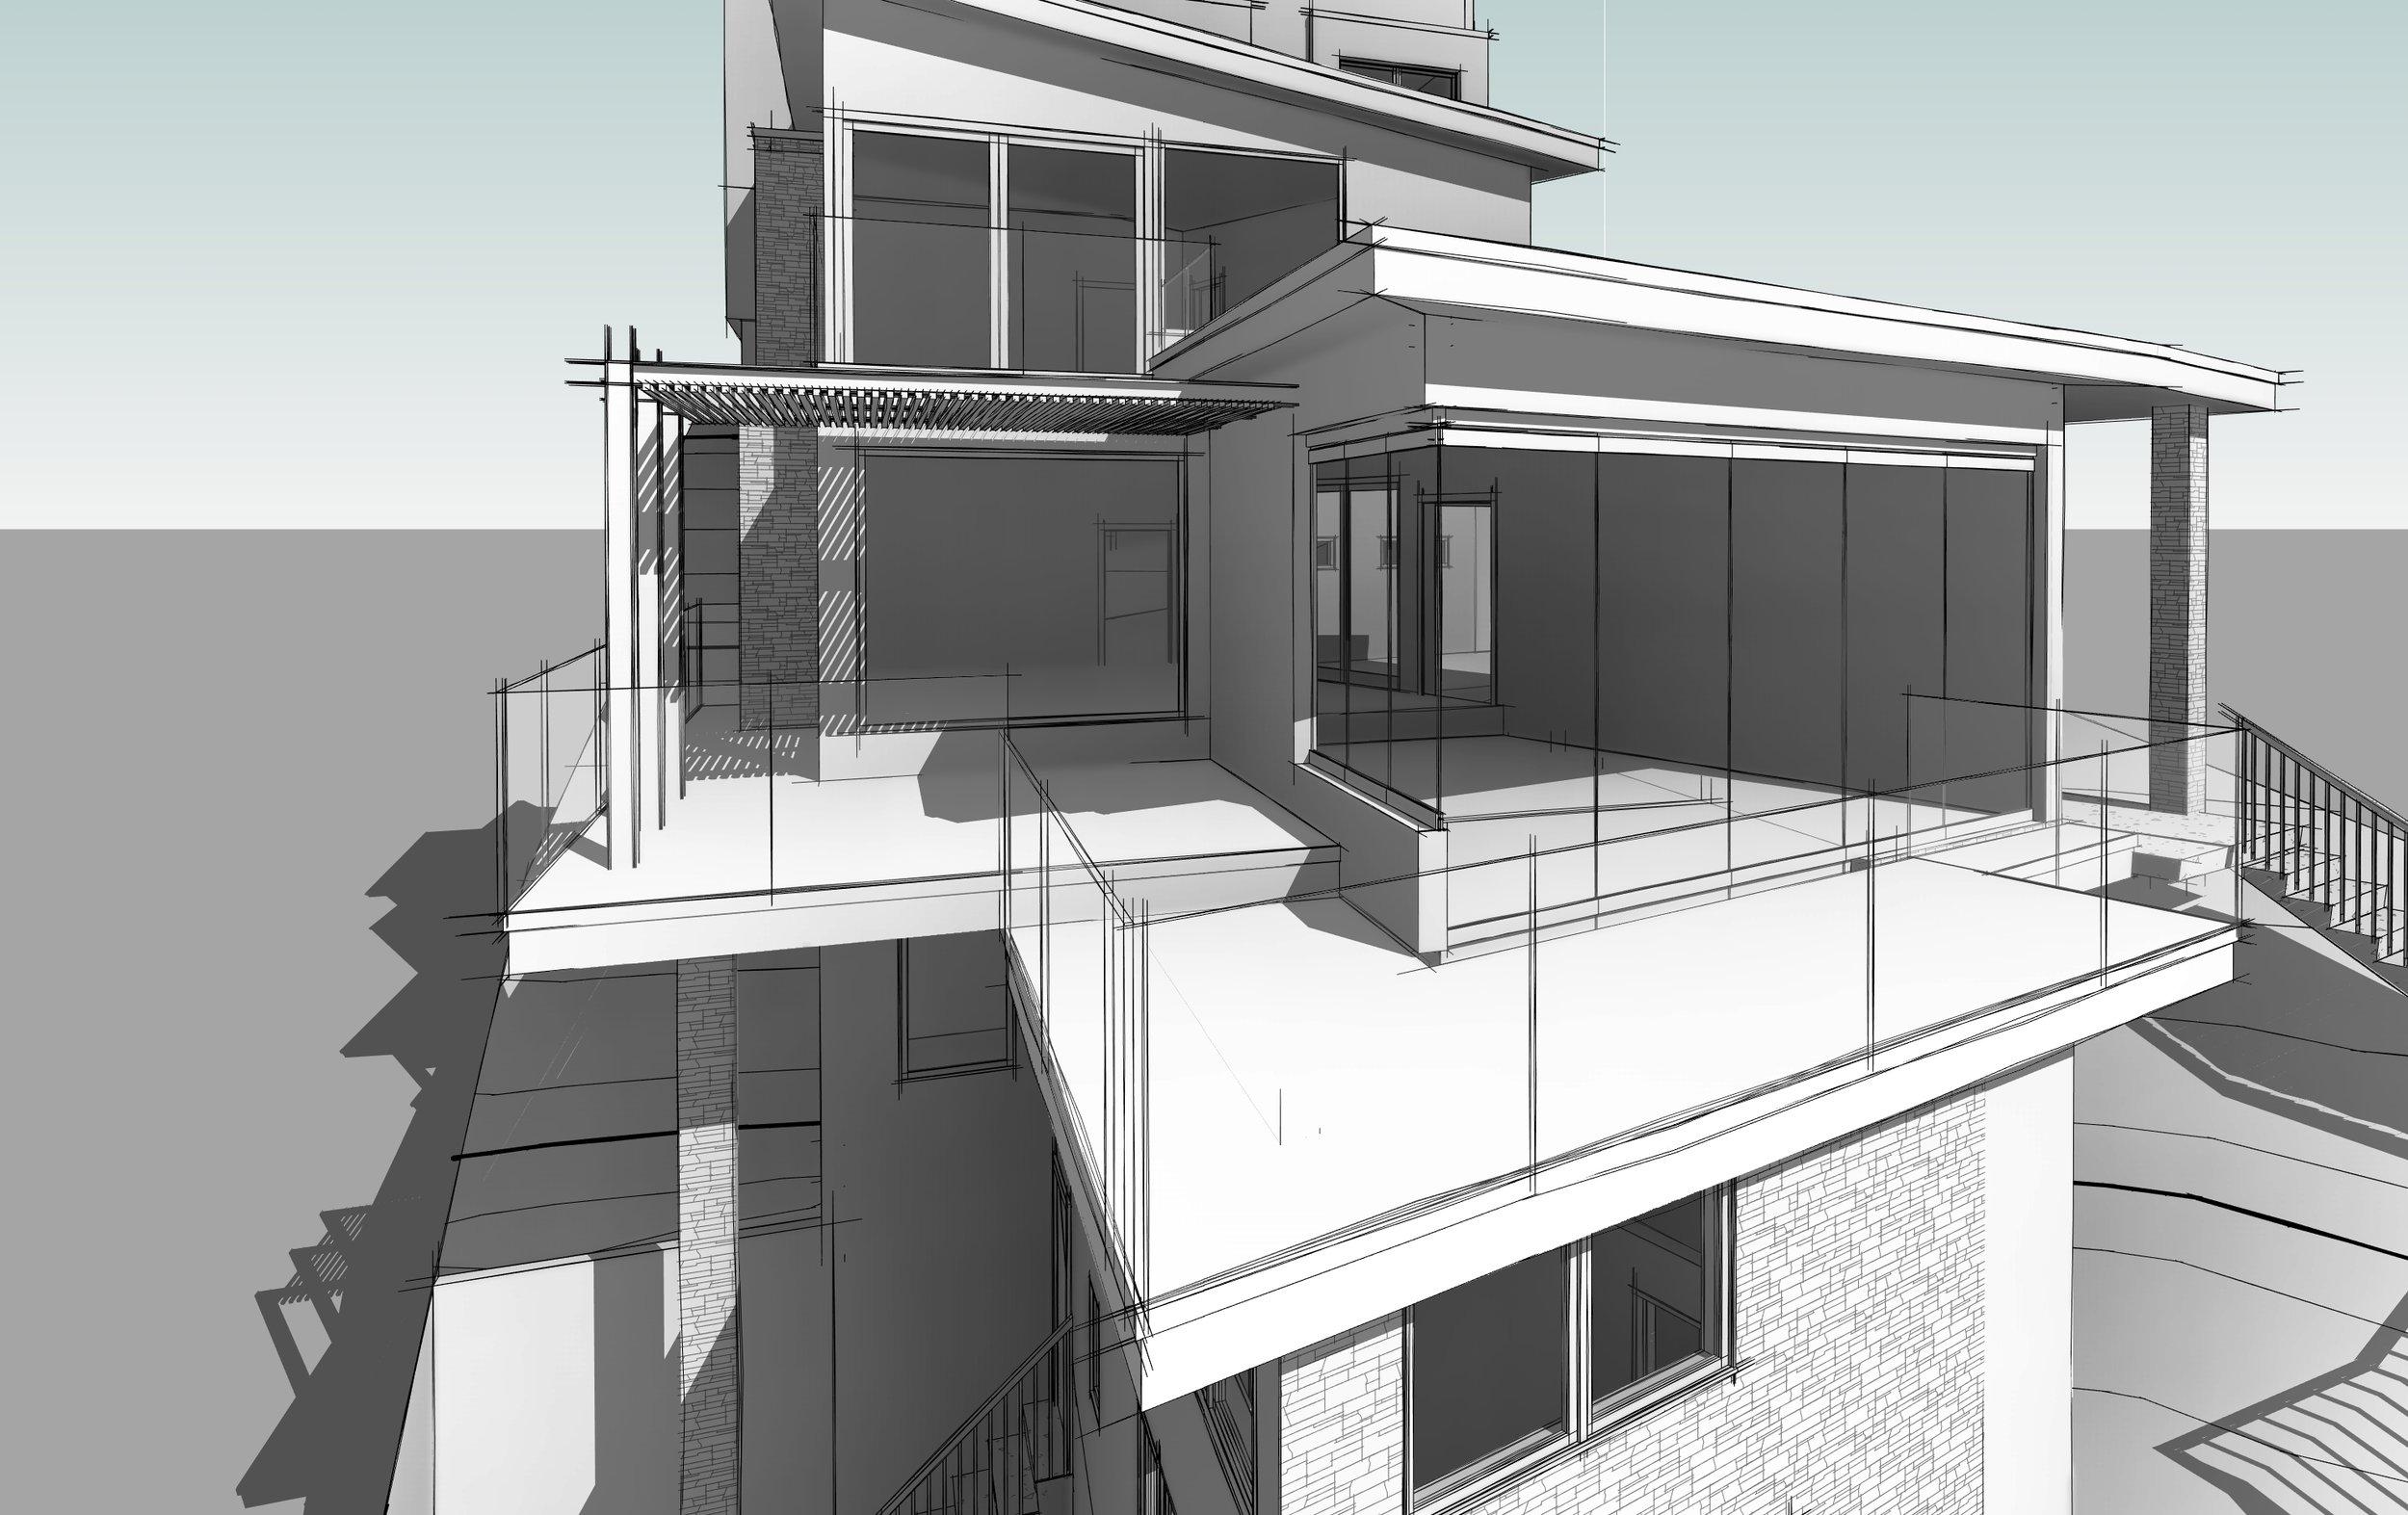 Proposed 3D Rendering